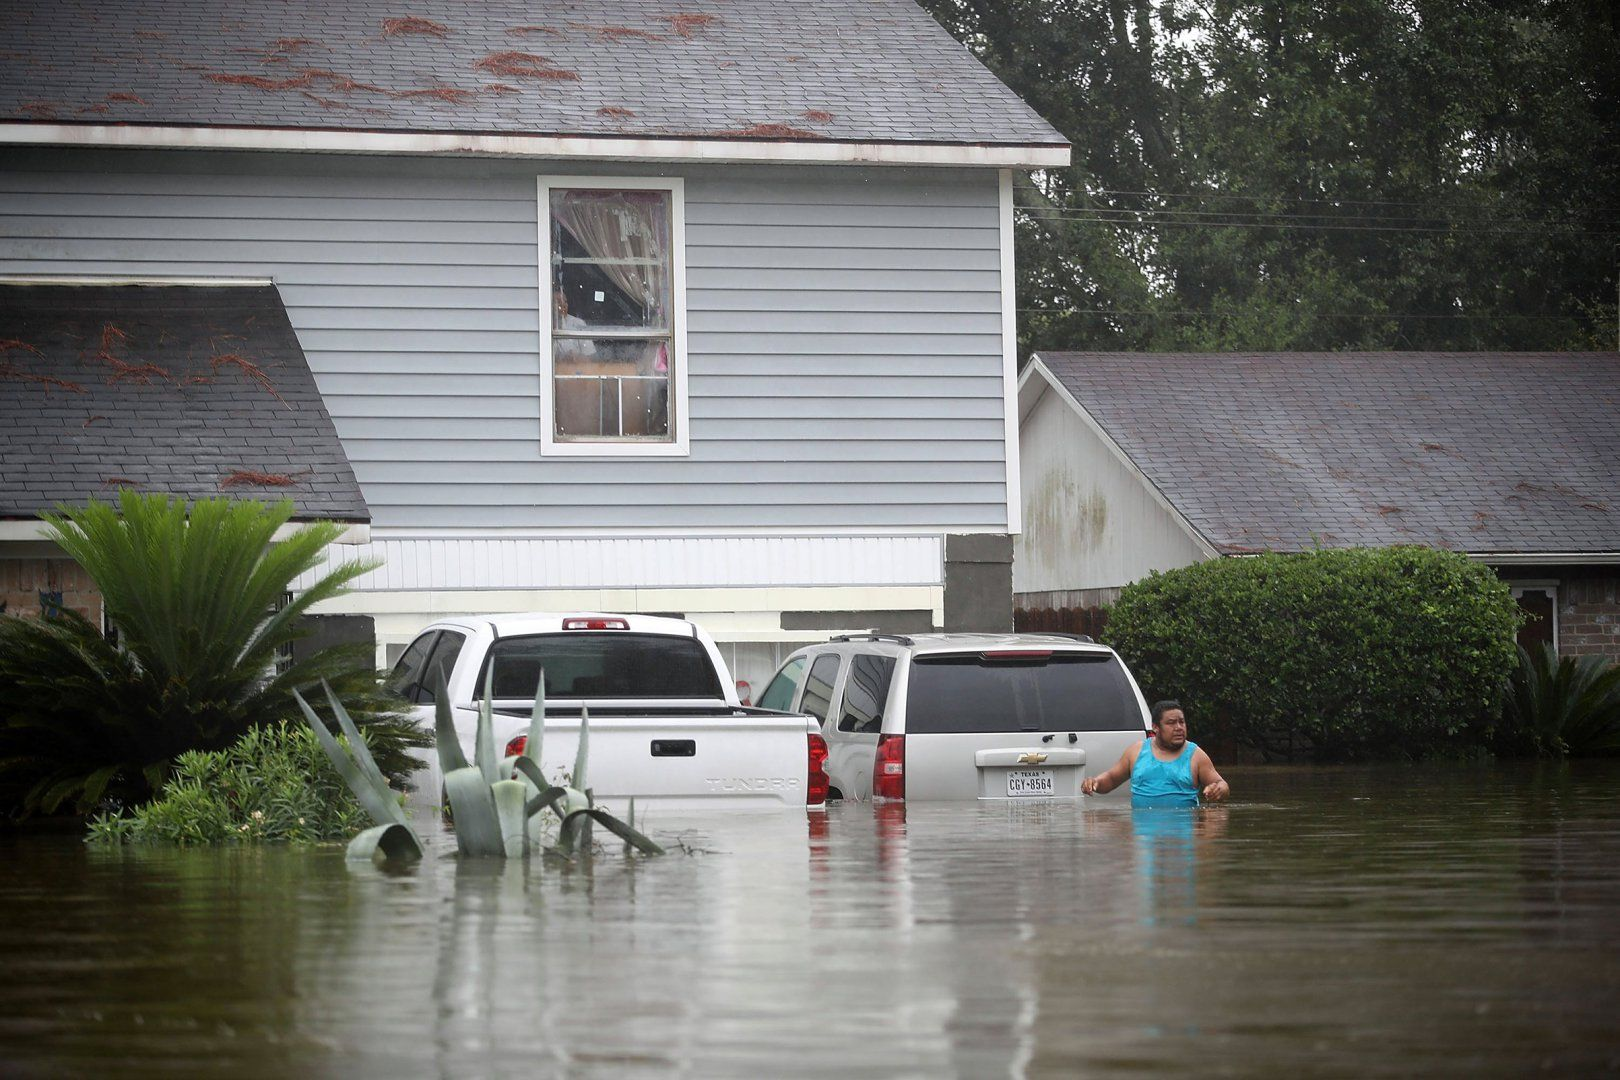 A Look At The Devastating Destruction Caused By Hurricane Harvey Flood Damage Restoration Harvey